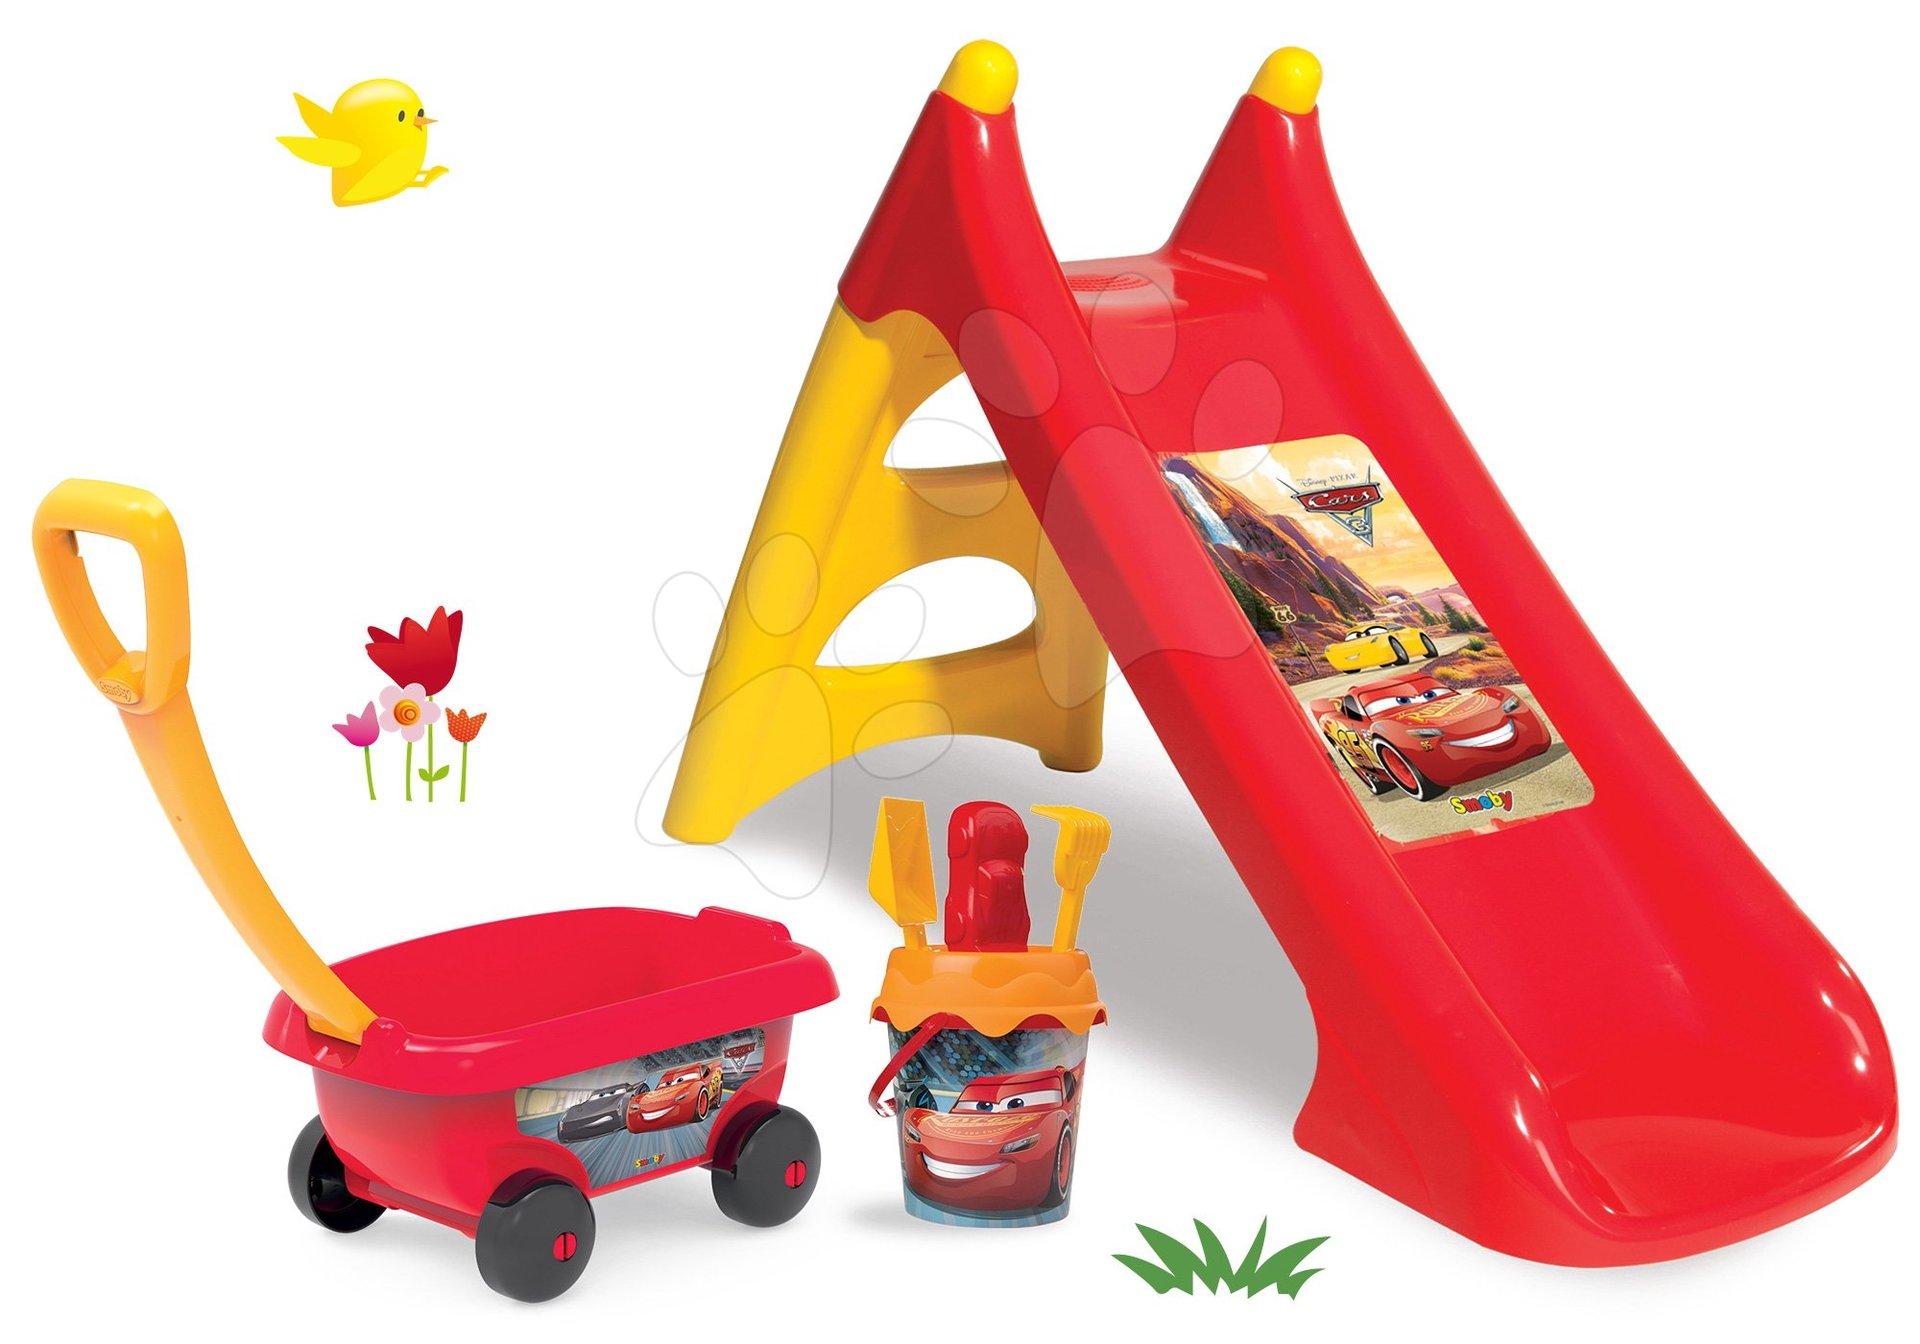 Šmykľavky sety - Set šmykľavka Autá Toboggan XS Smoby dĺžka 90 cm a vozík s vedro setom Autá